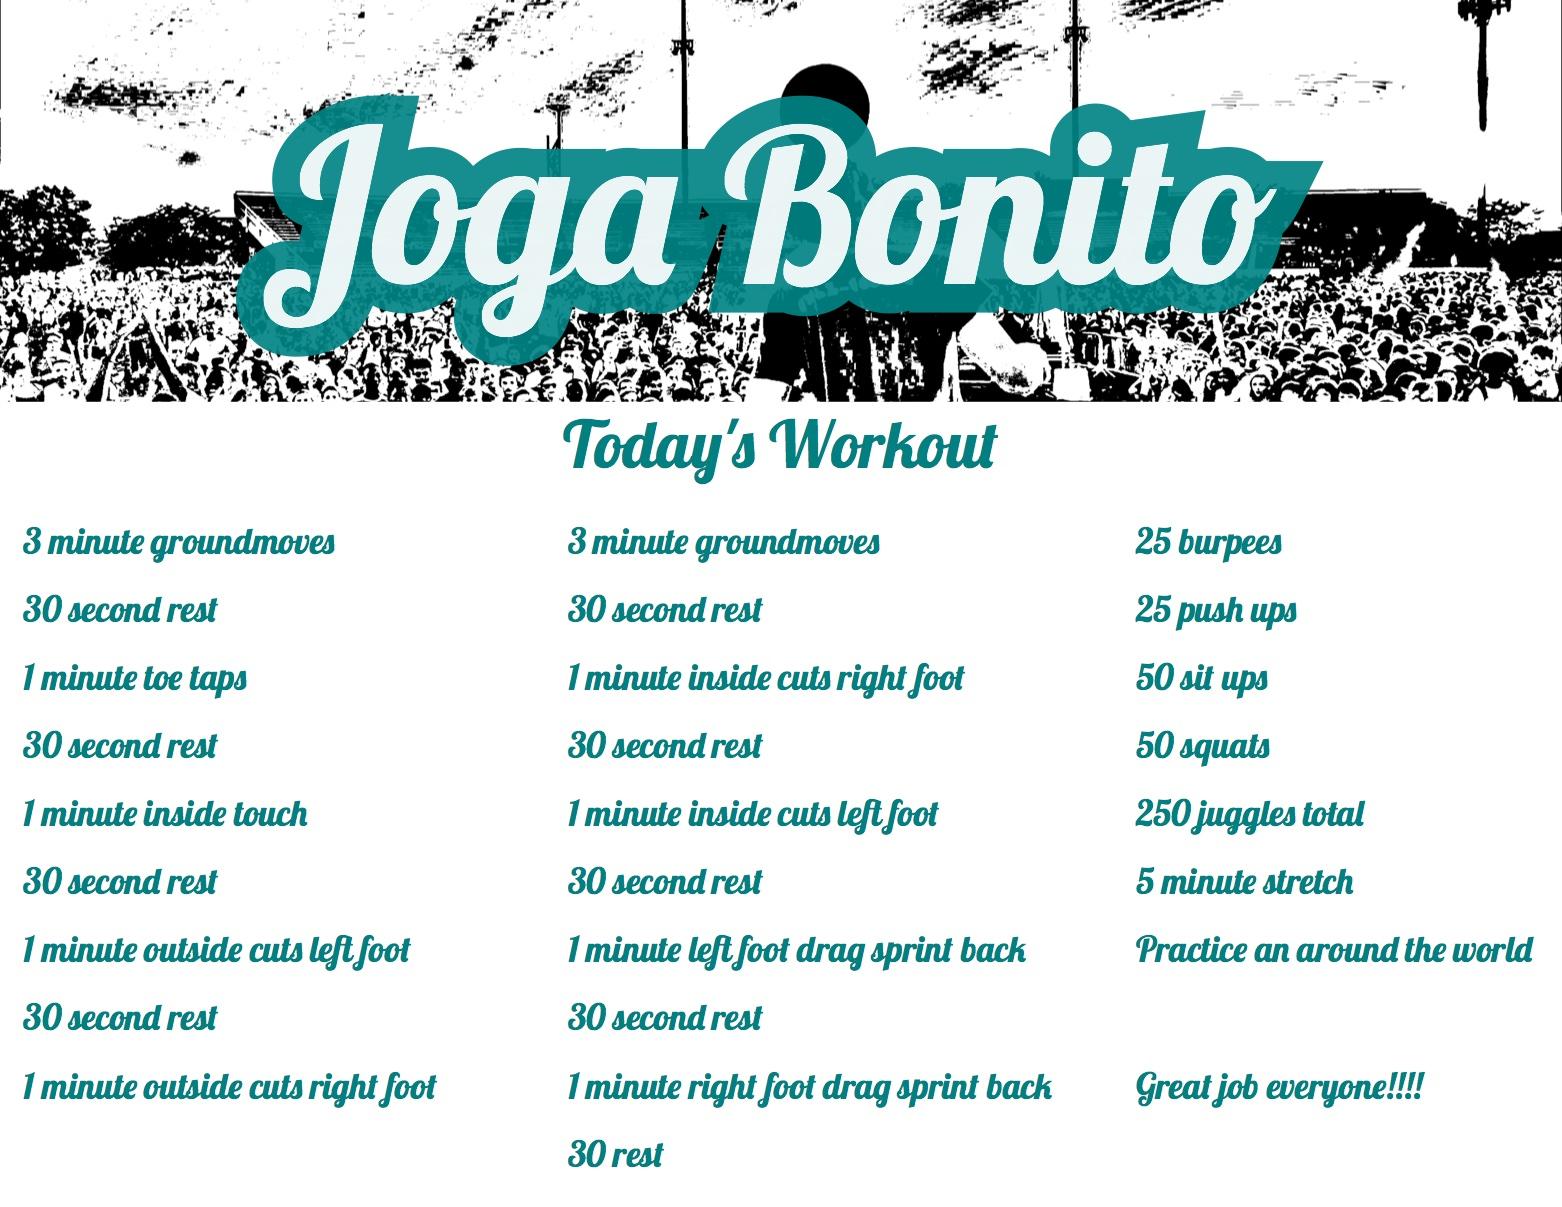 Joga Bonito Workout April 9th